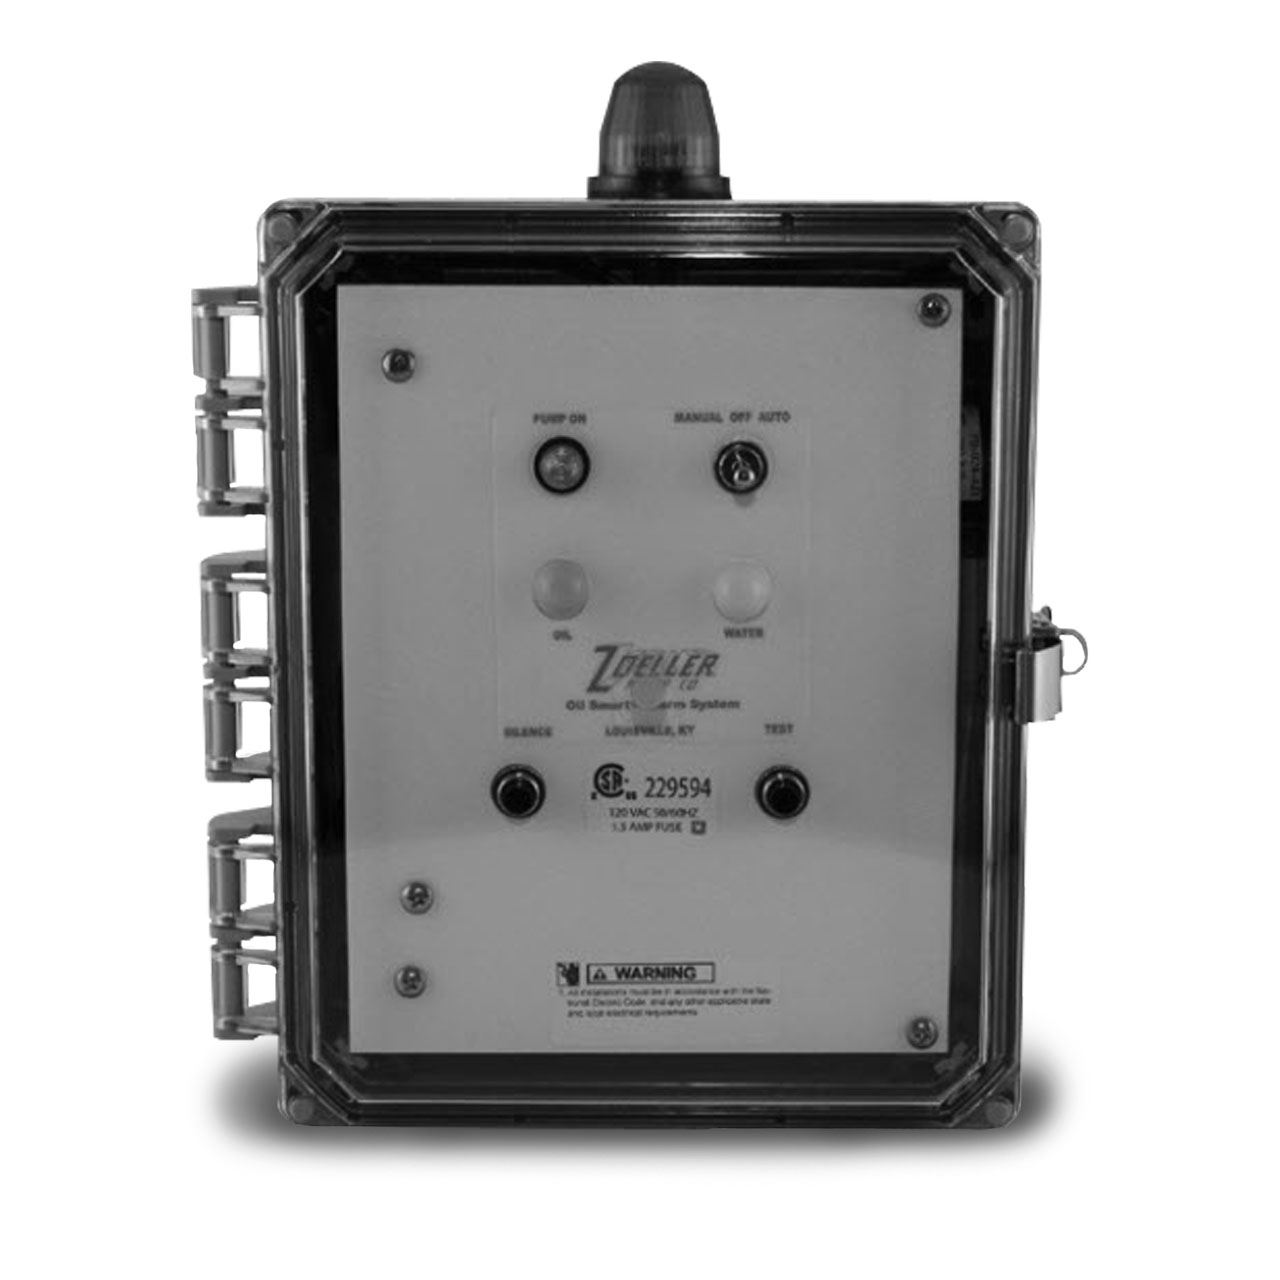 small resolution of zoeller duplex pump control panel wiring diagram zoeller zoeller 10 2149 oil smart